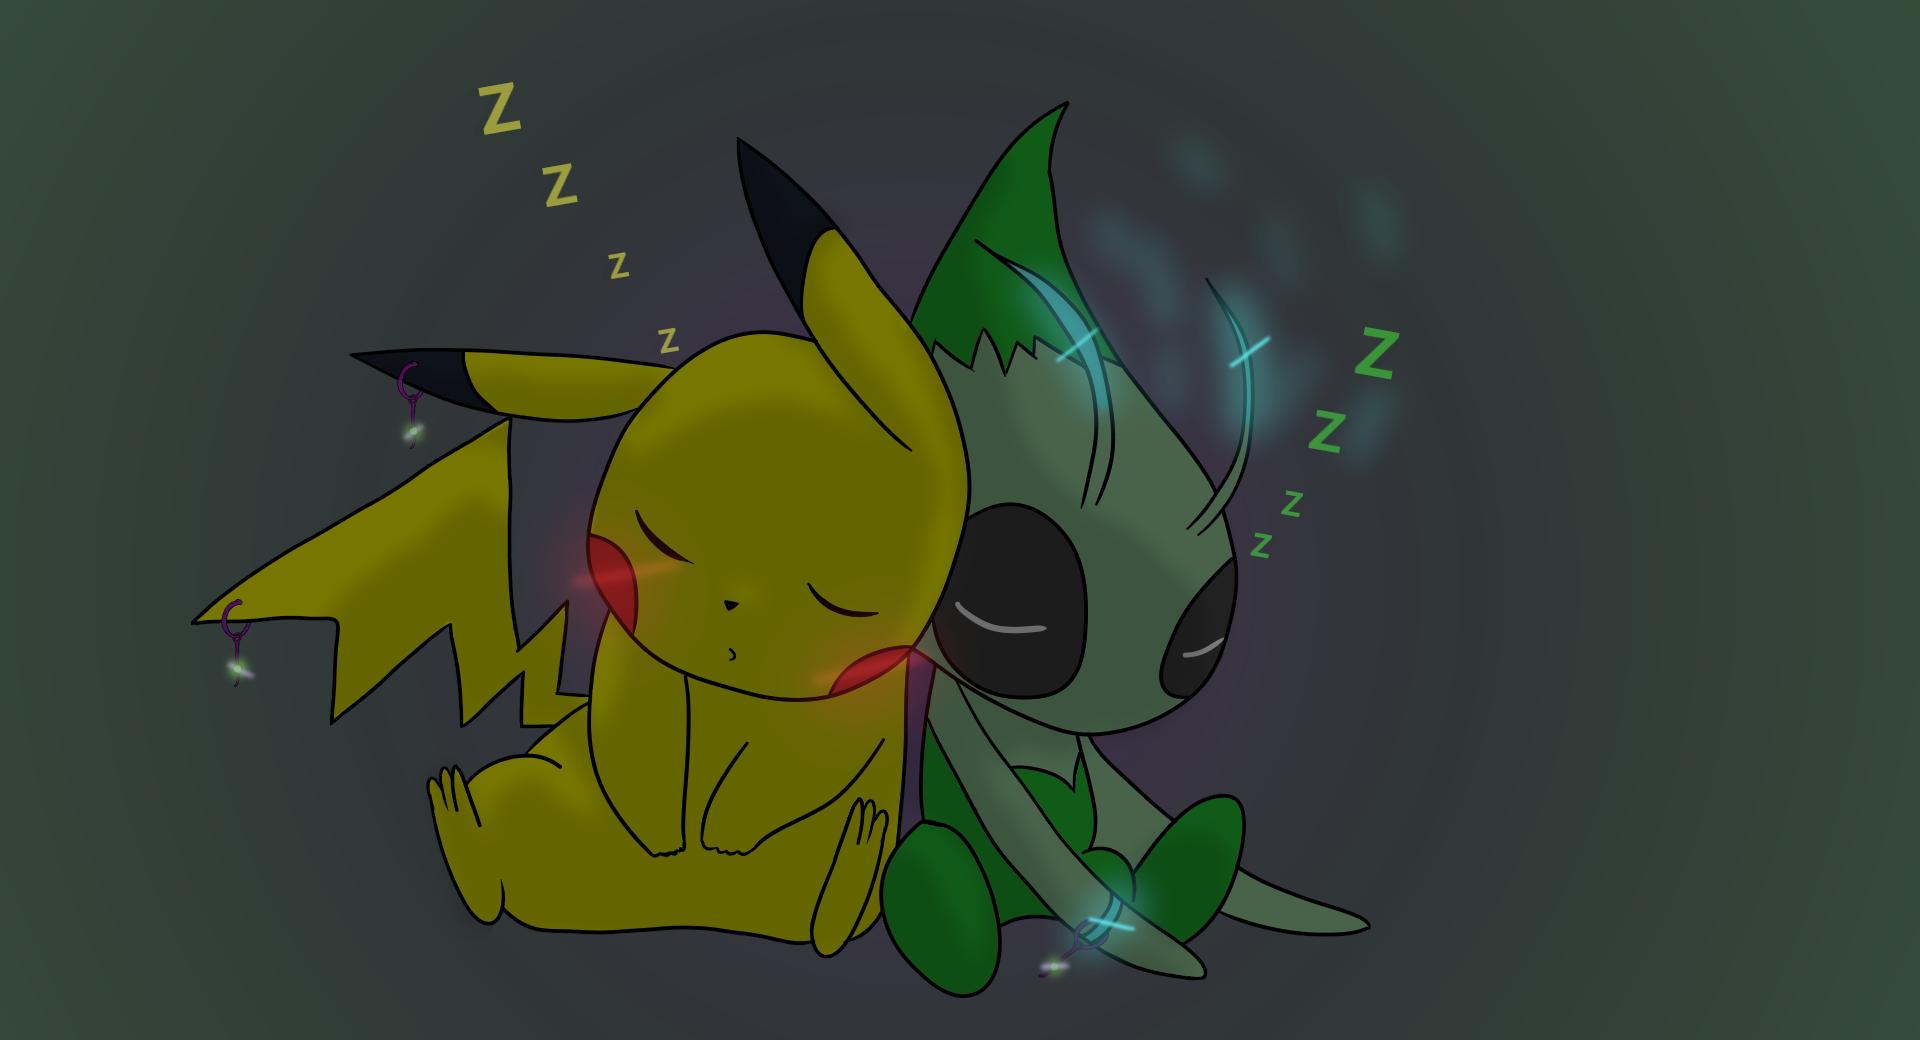 pikachu and celebi sleeping